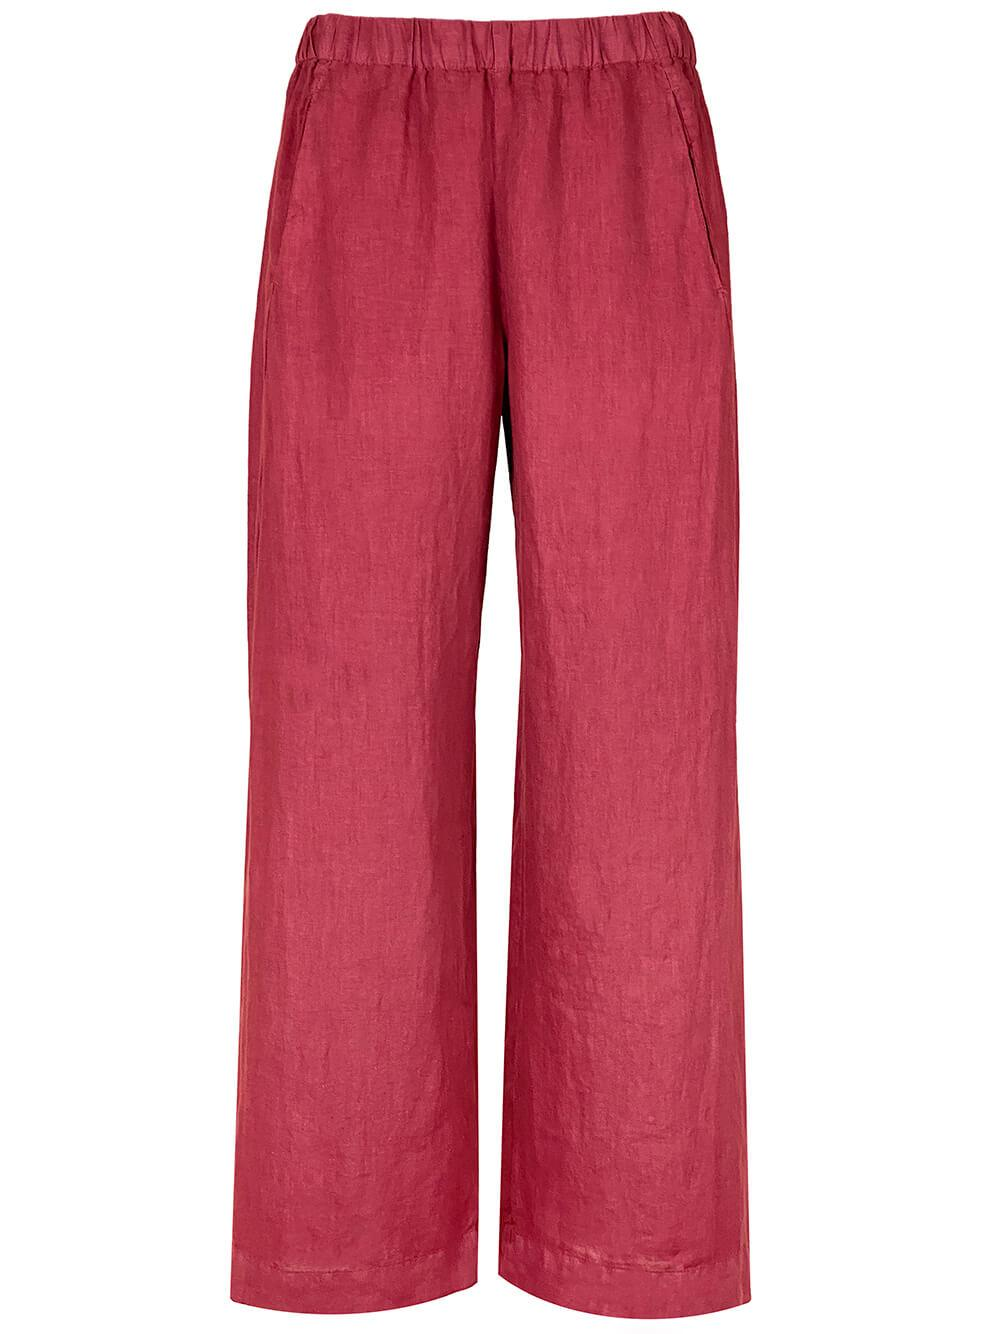 Linen Cropped Wide Leg Pants Item # LOLA04